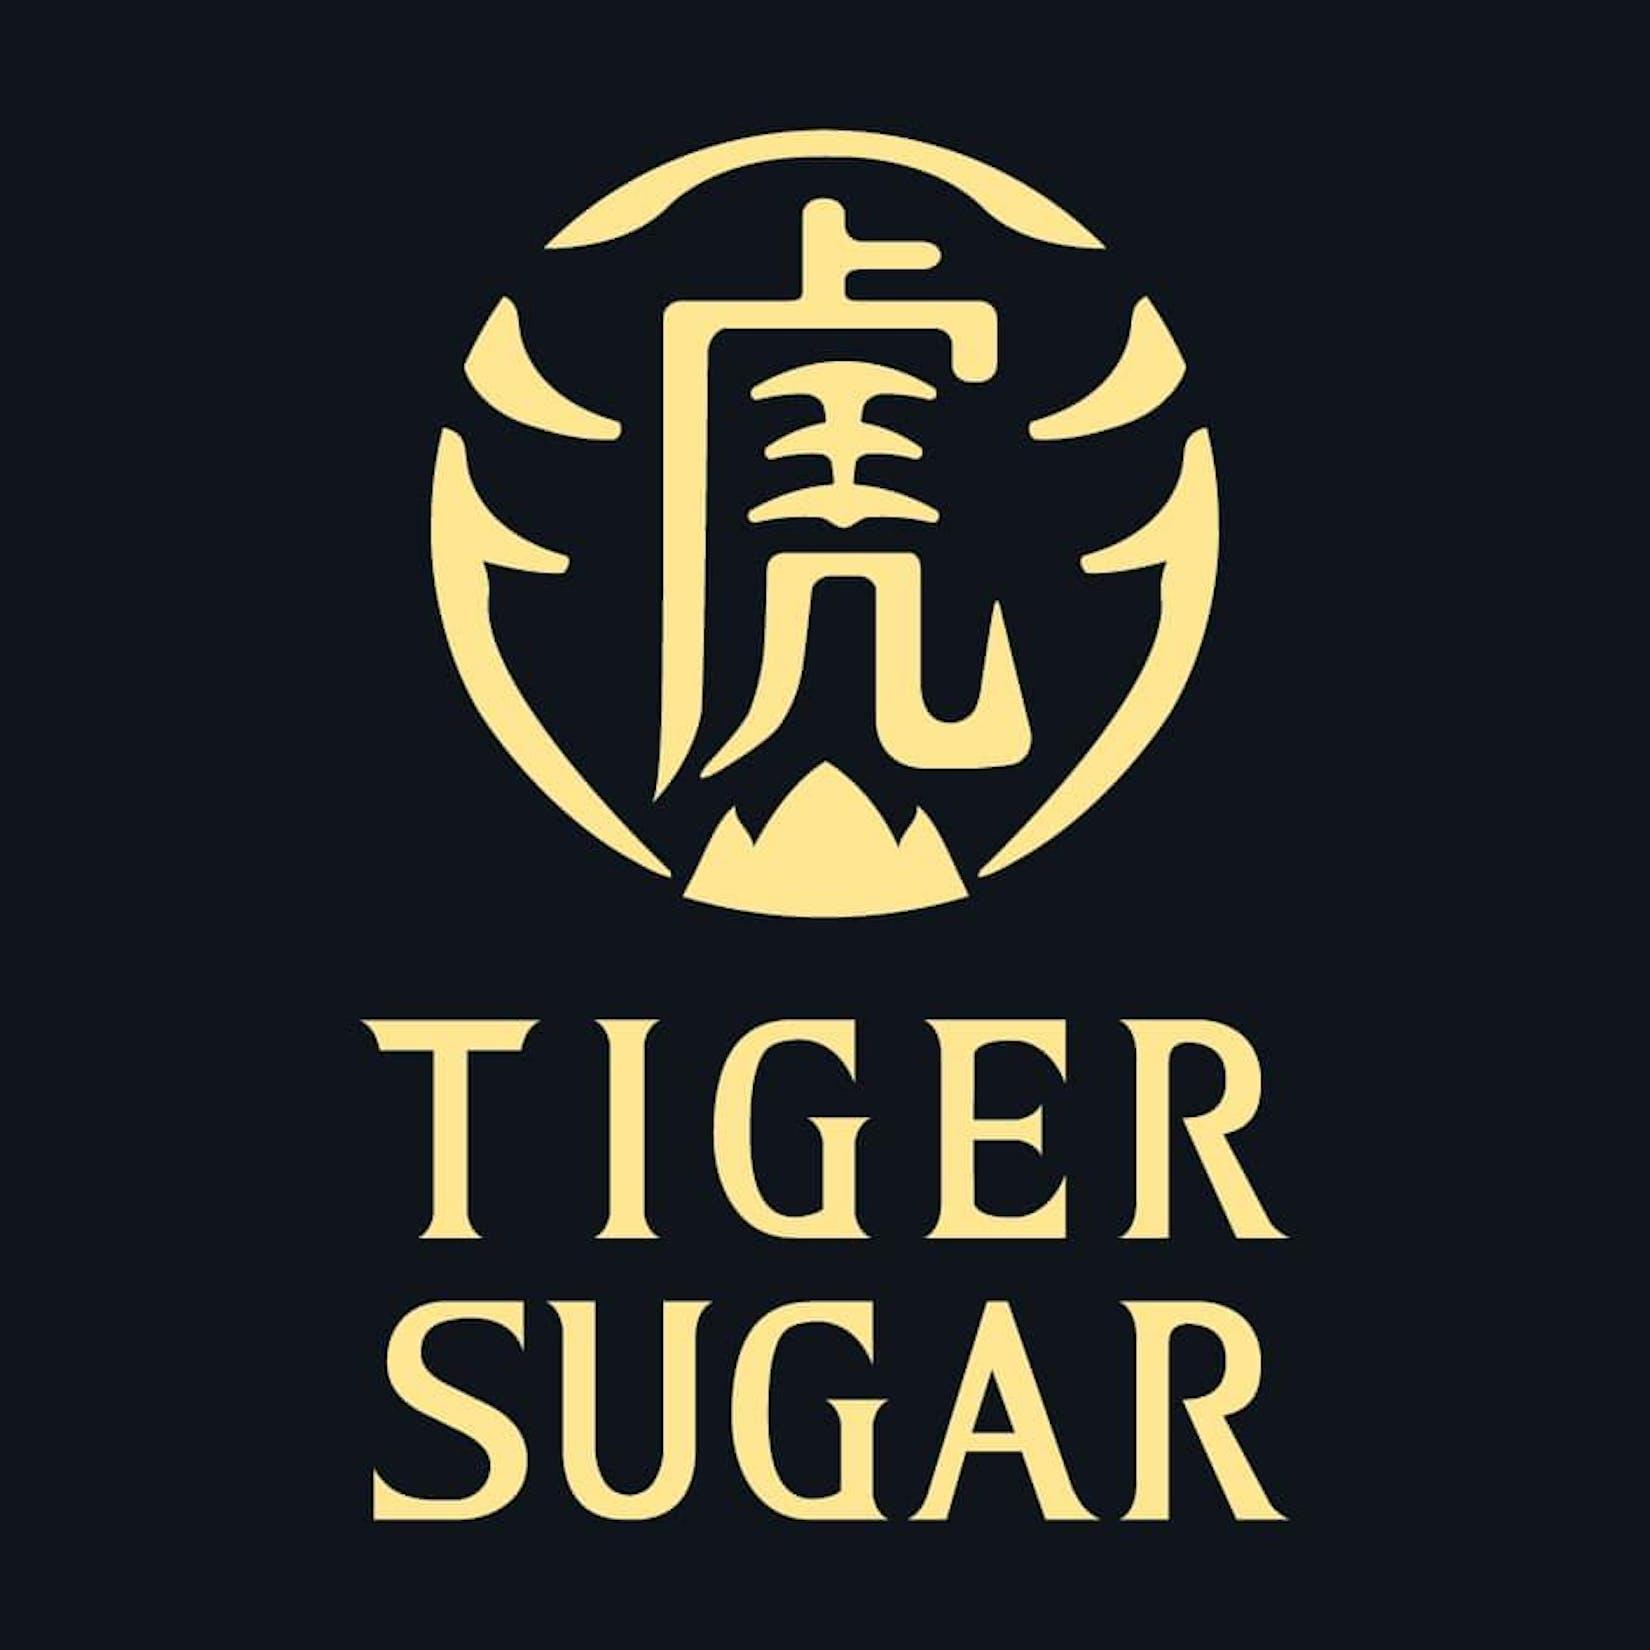 Tiger Sugar Myanmar (Myanmar Plaza) | yathar